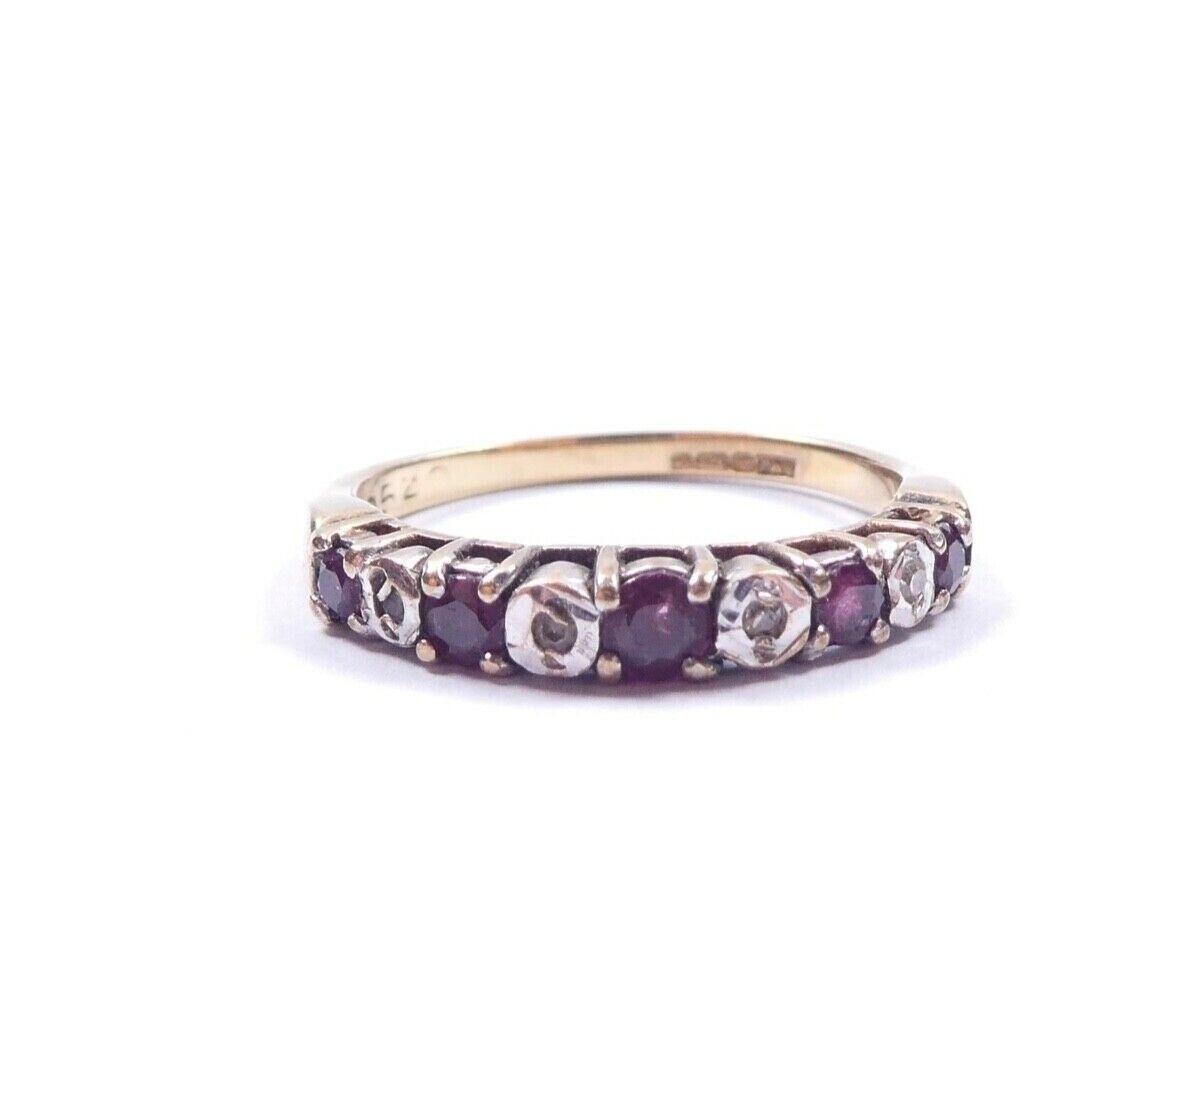 Eternity Ring Amethyst And Diamond 9 Carat Yellow gold 1.8g UK Size J 1 2